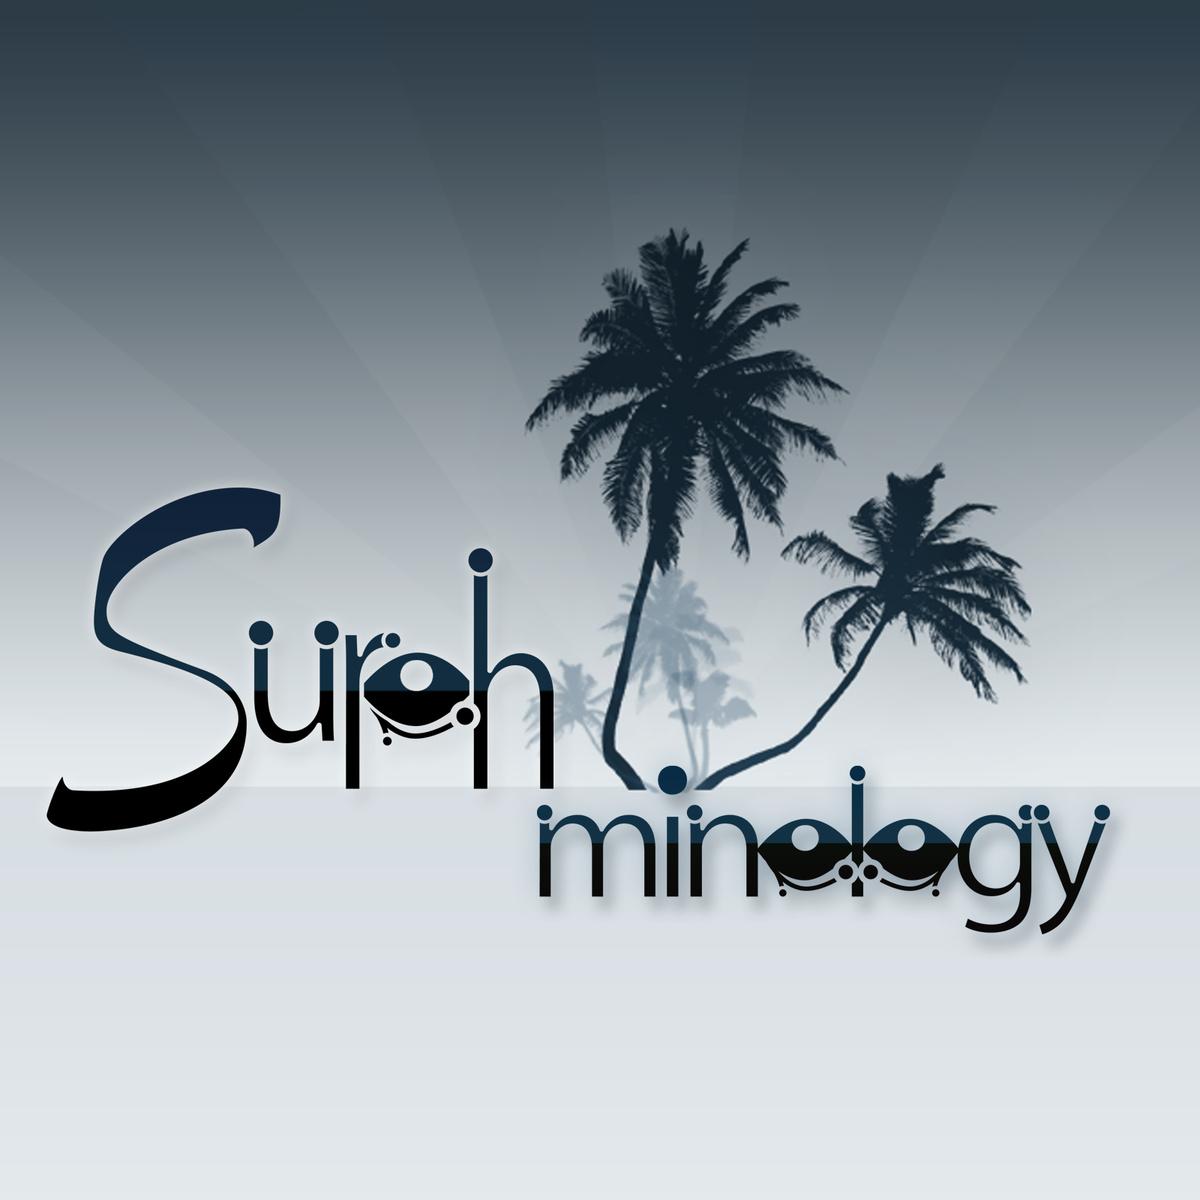 Minology – Suroh –